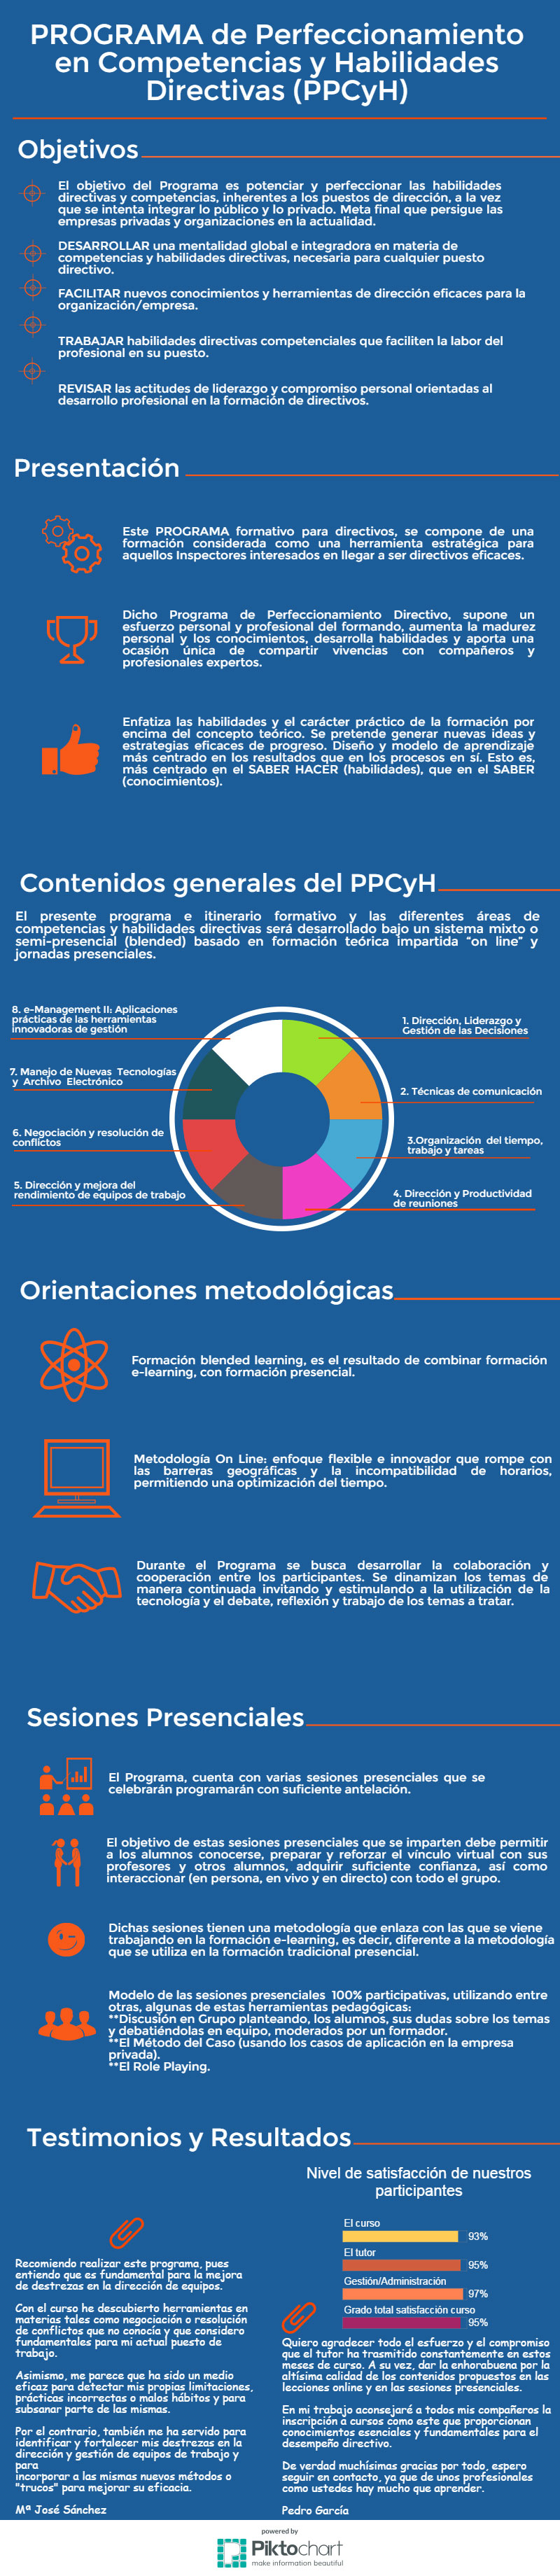 infografia-ppcyh-sector-pri